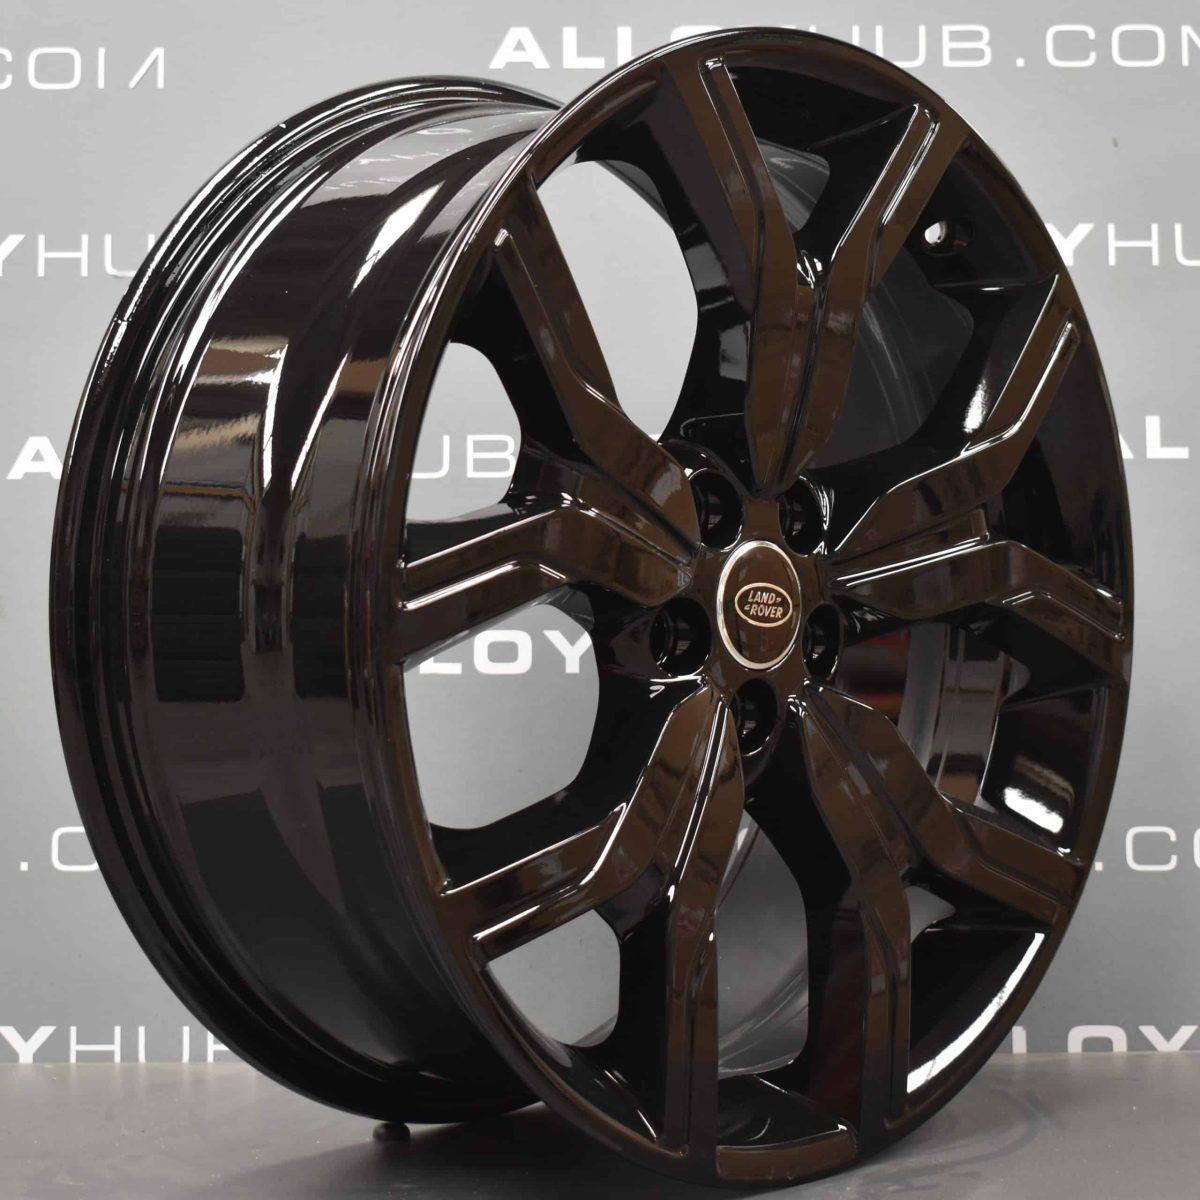 "Genuine Range Rover Evoque L538 20"" inch Style 527 5 Split-Spoke Gloss Black Alloy Wheels EJ3M1007BB"